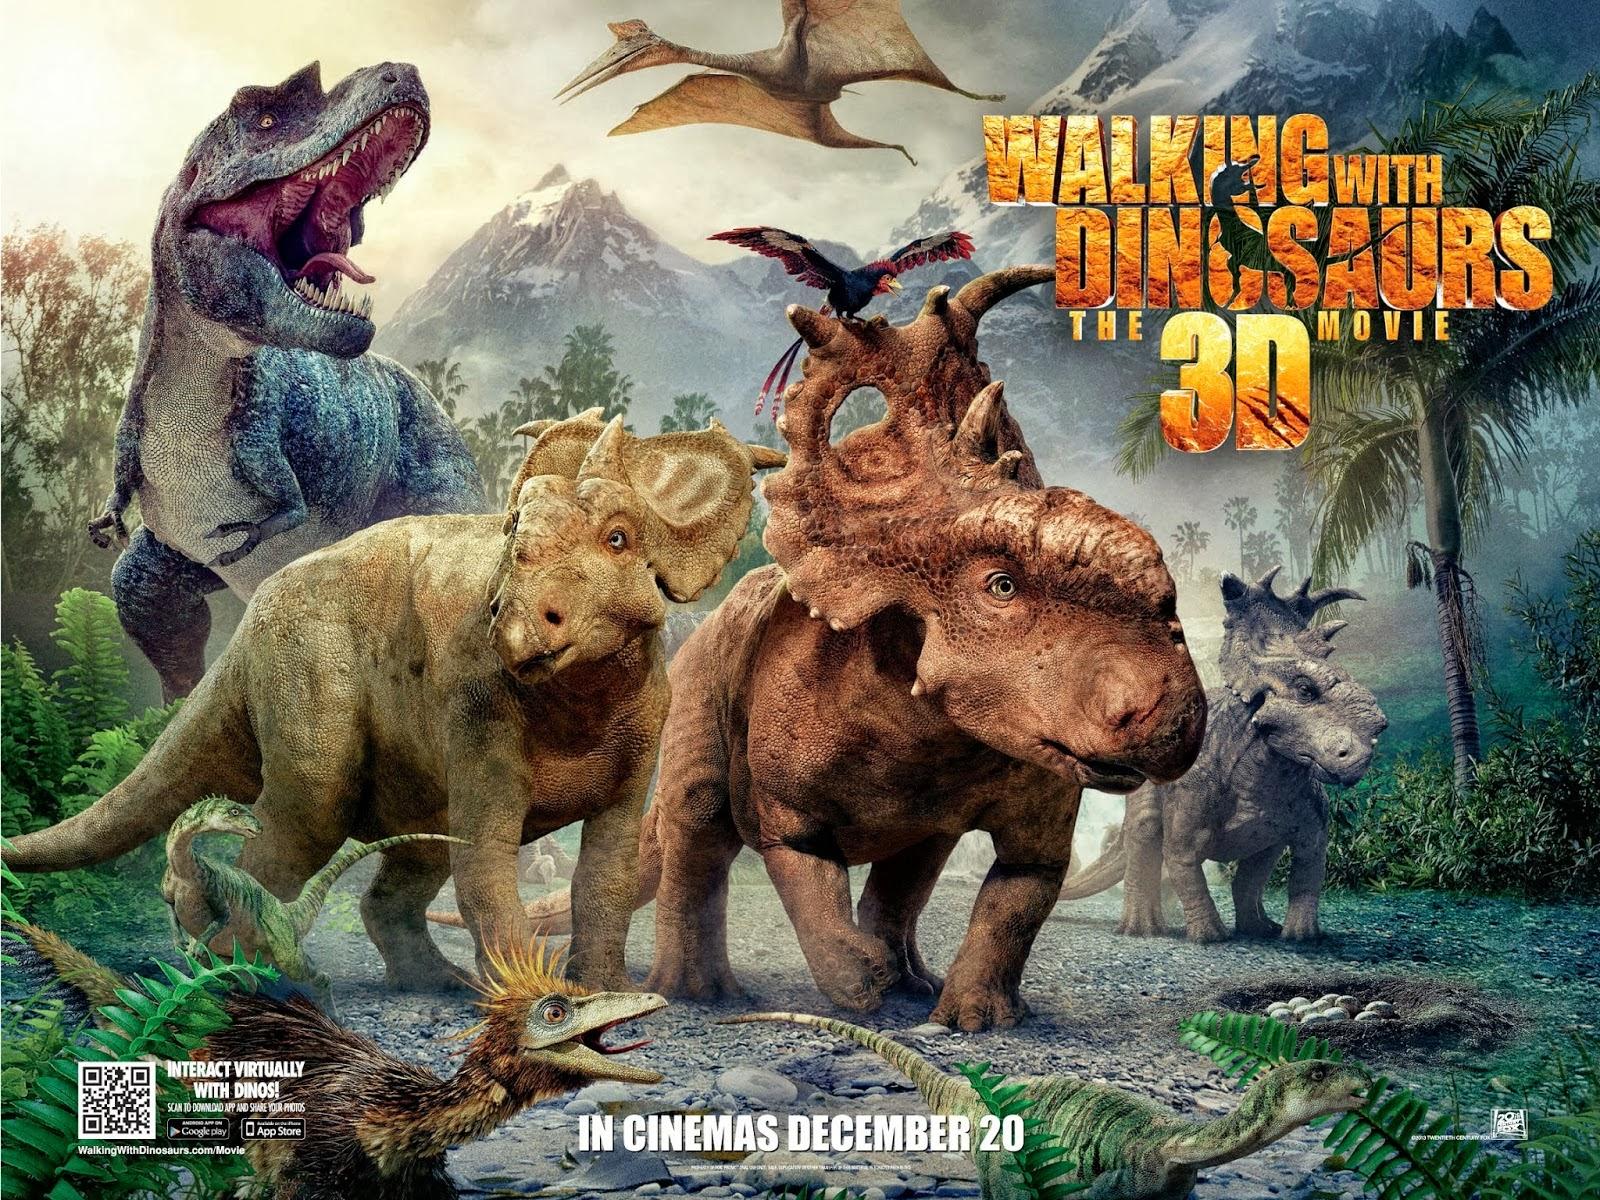 Movie4k Watch Walking with Dinosaurs 3D (2013) Full Movie Online